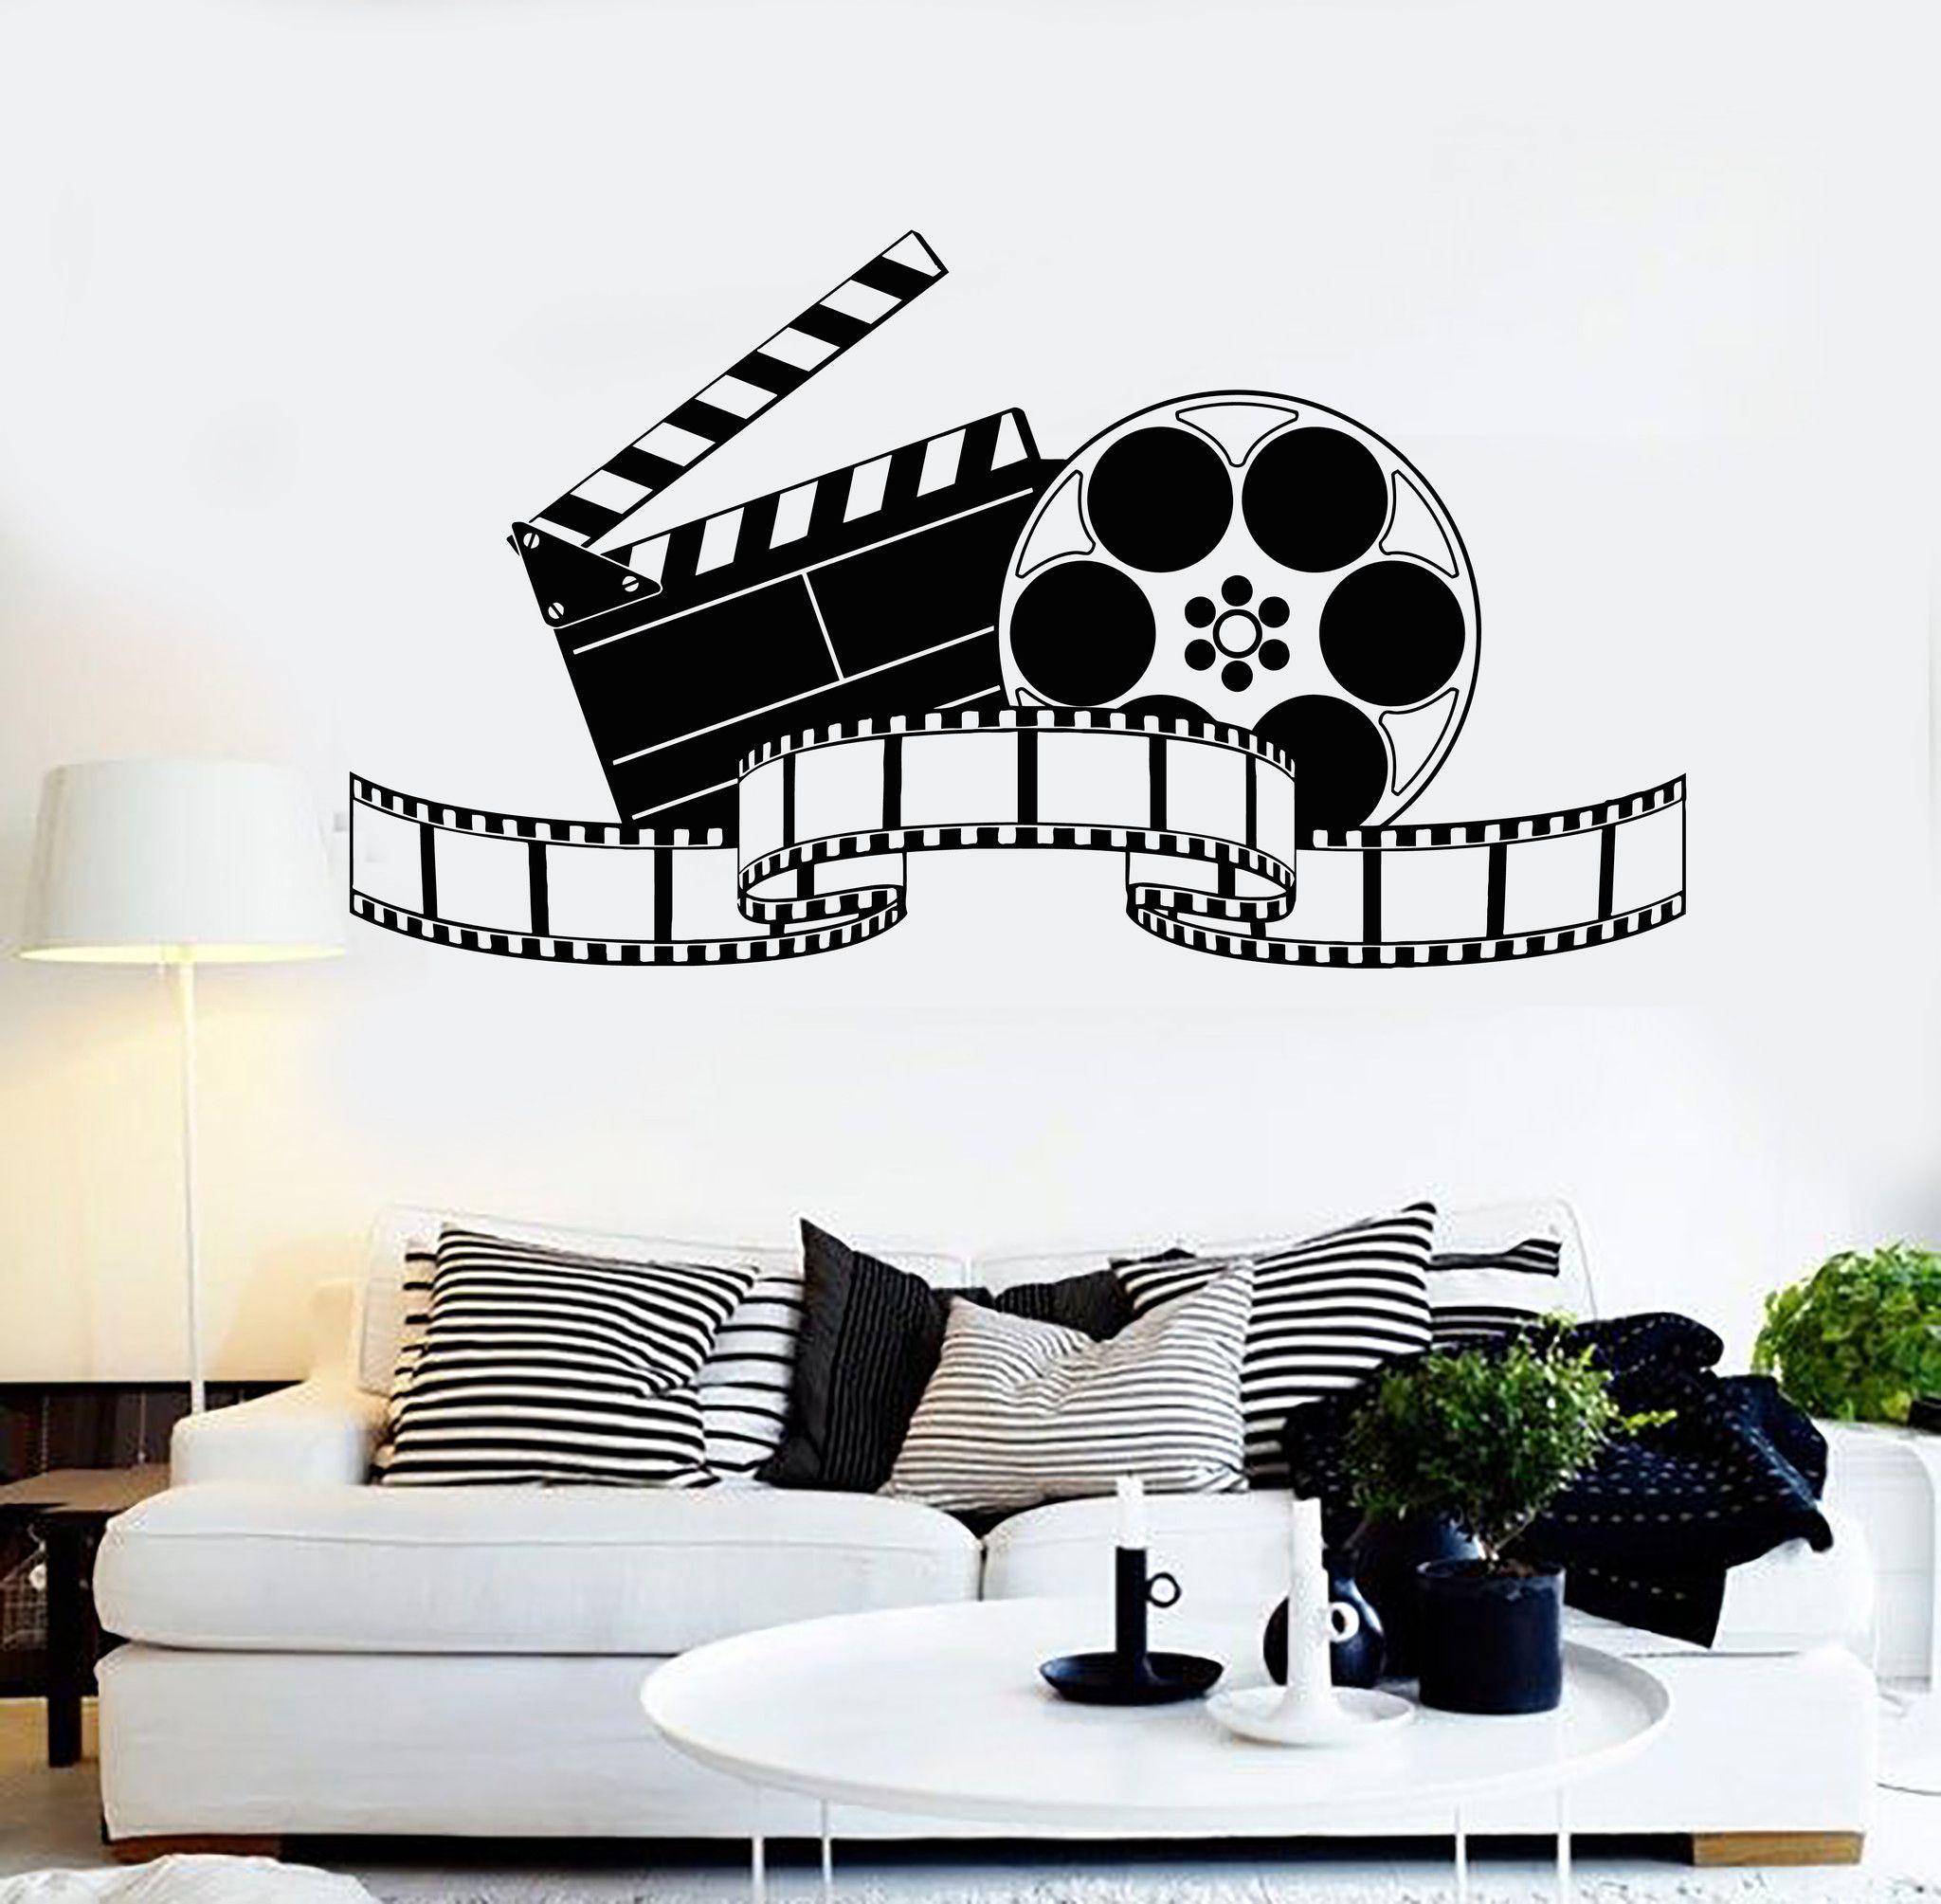 Vinyl wall decal filming art cinema film movie stickers - Stickers cinema mural ...